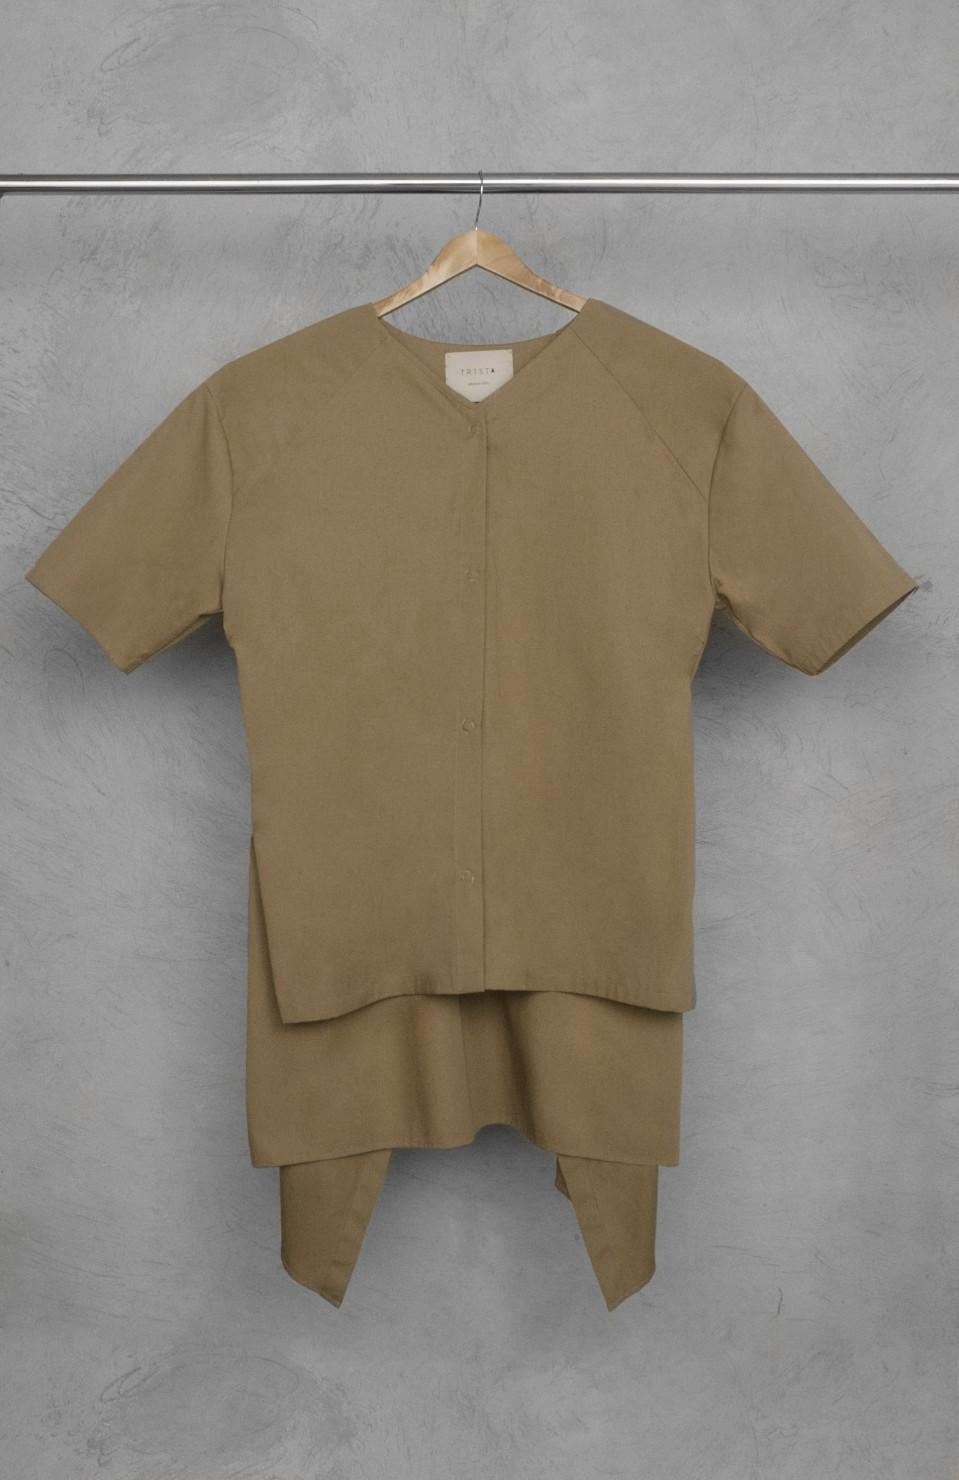 Othmar Shneider I Shirt